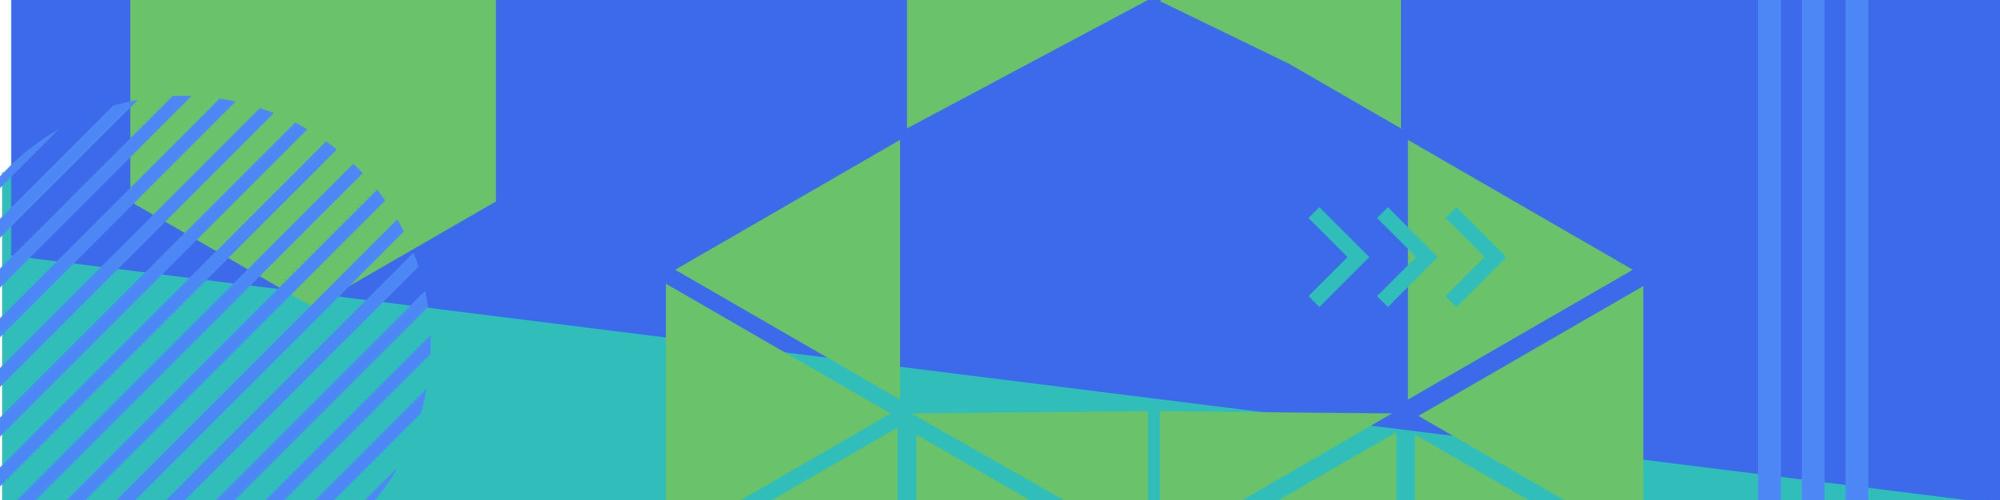 https://res.cloudinary.com/accelevents/image/fetch/c_fill,dpr_1.0,f_auto,fl_lossy,h_500,q_100,w_2000/https://s3.amazonaws.com/v2-s3-prod-accelevents/d989d3dd-9b45-4fe0-8f6e-ae3e1fe78cb1